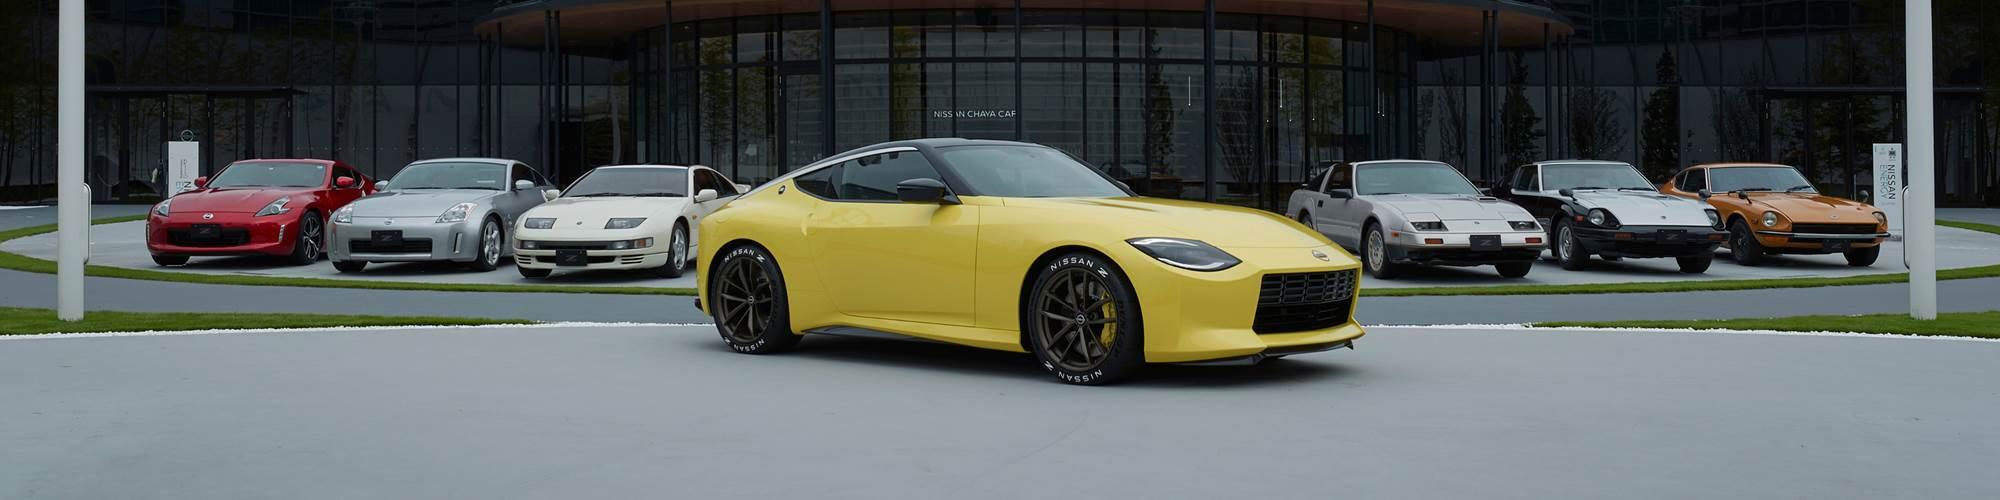 Nissan Z Proto previews next-generation sports car